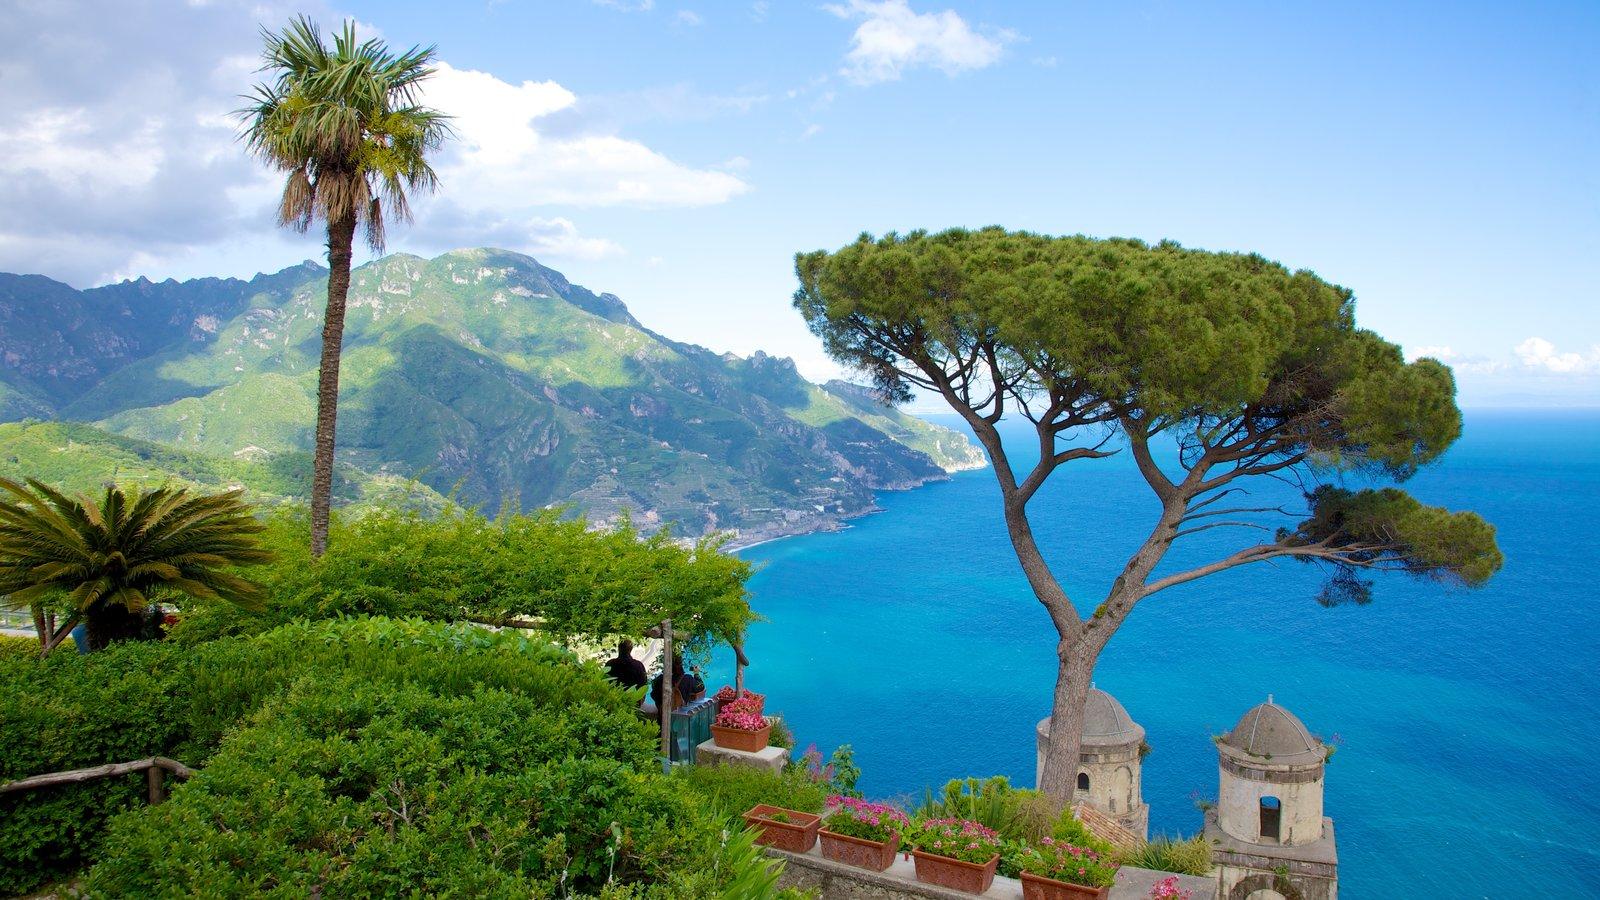 Villa Rufolo featuring landscape views, mountains and general coastal views